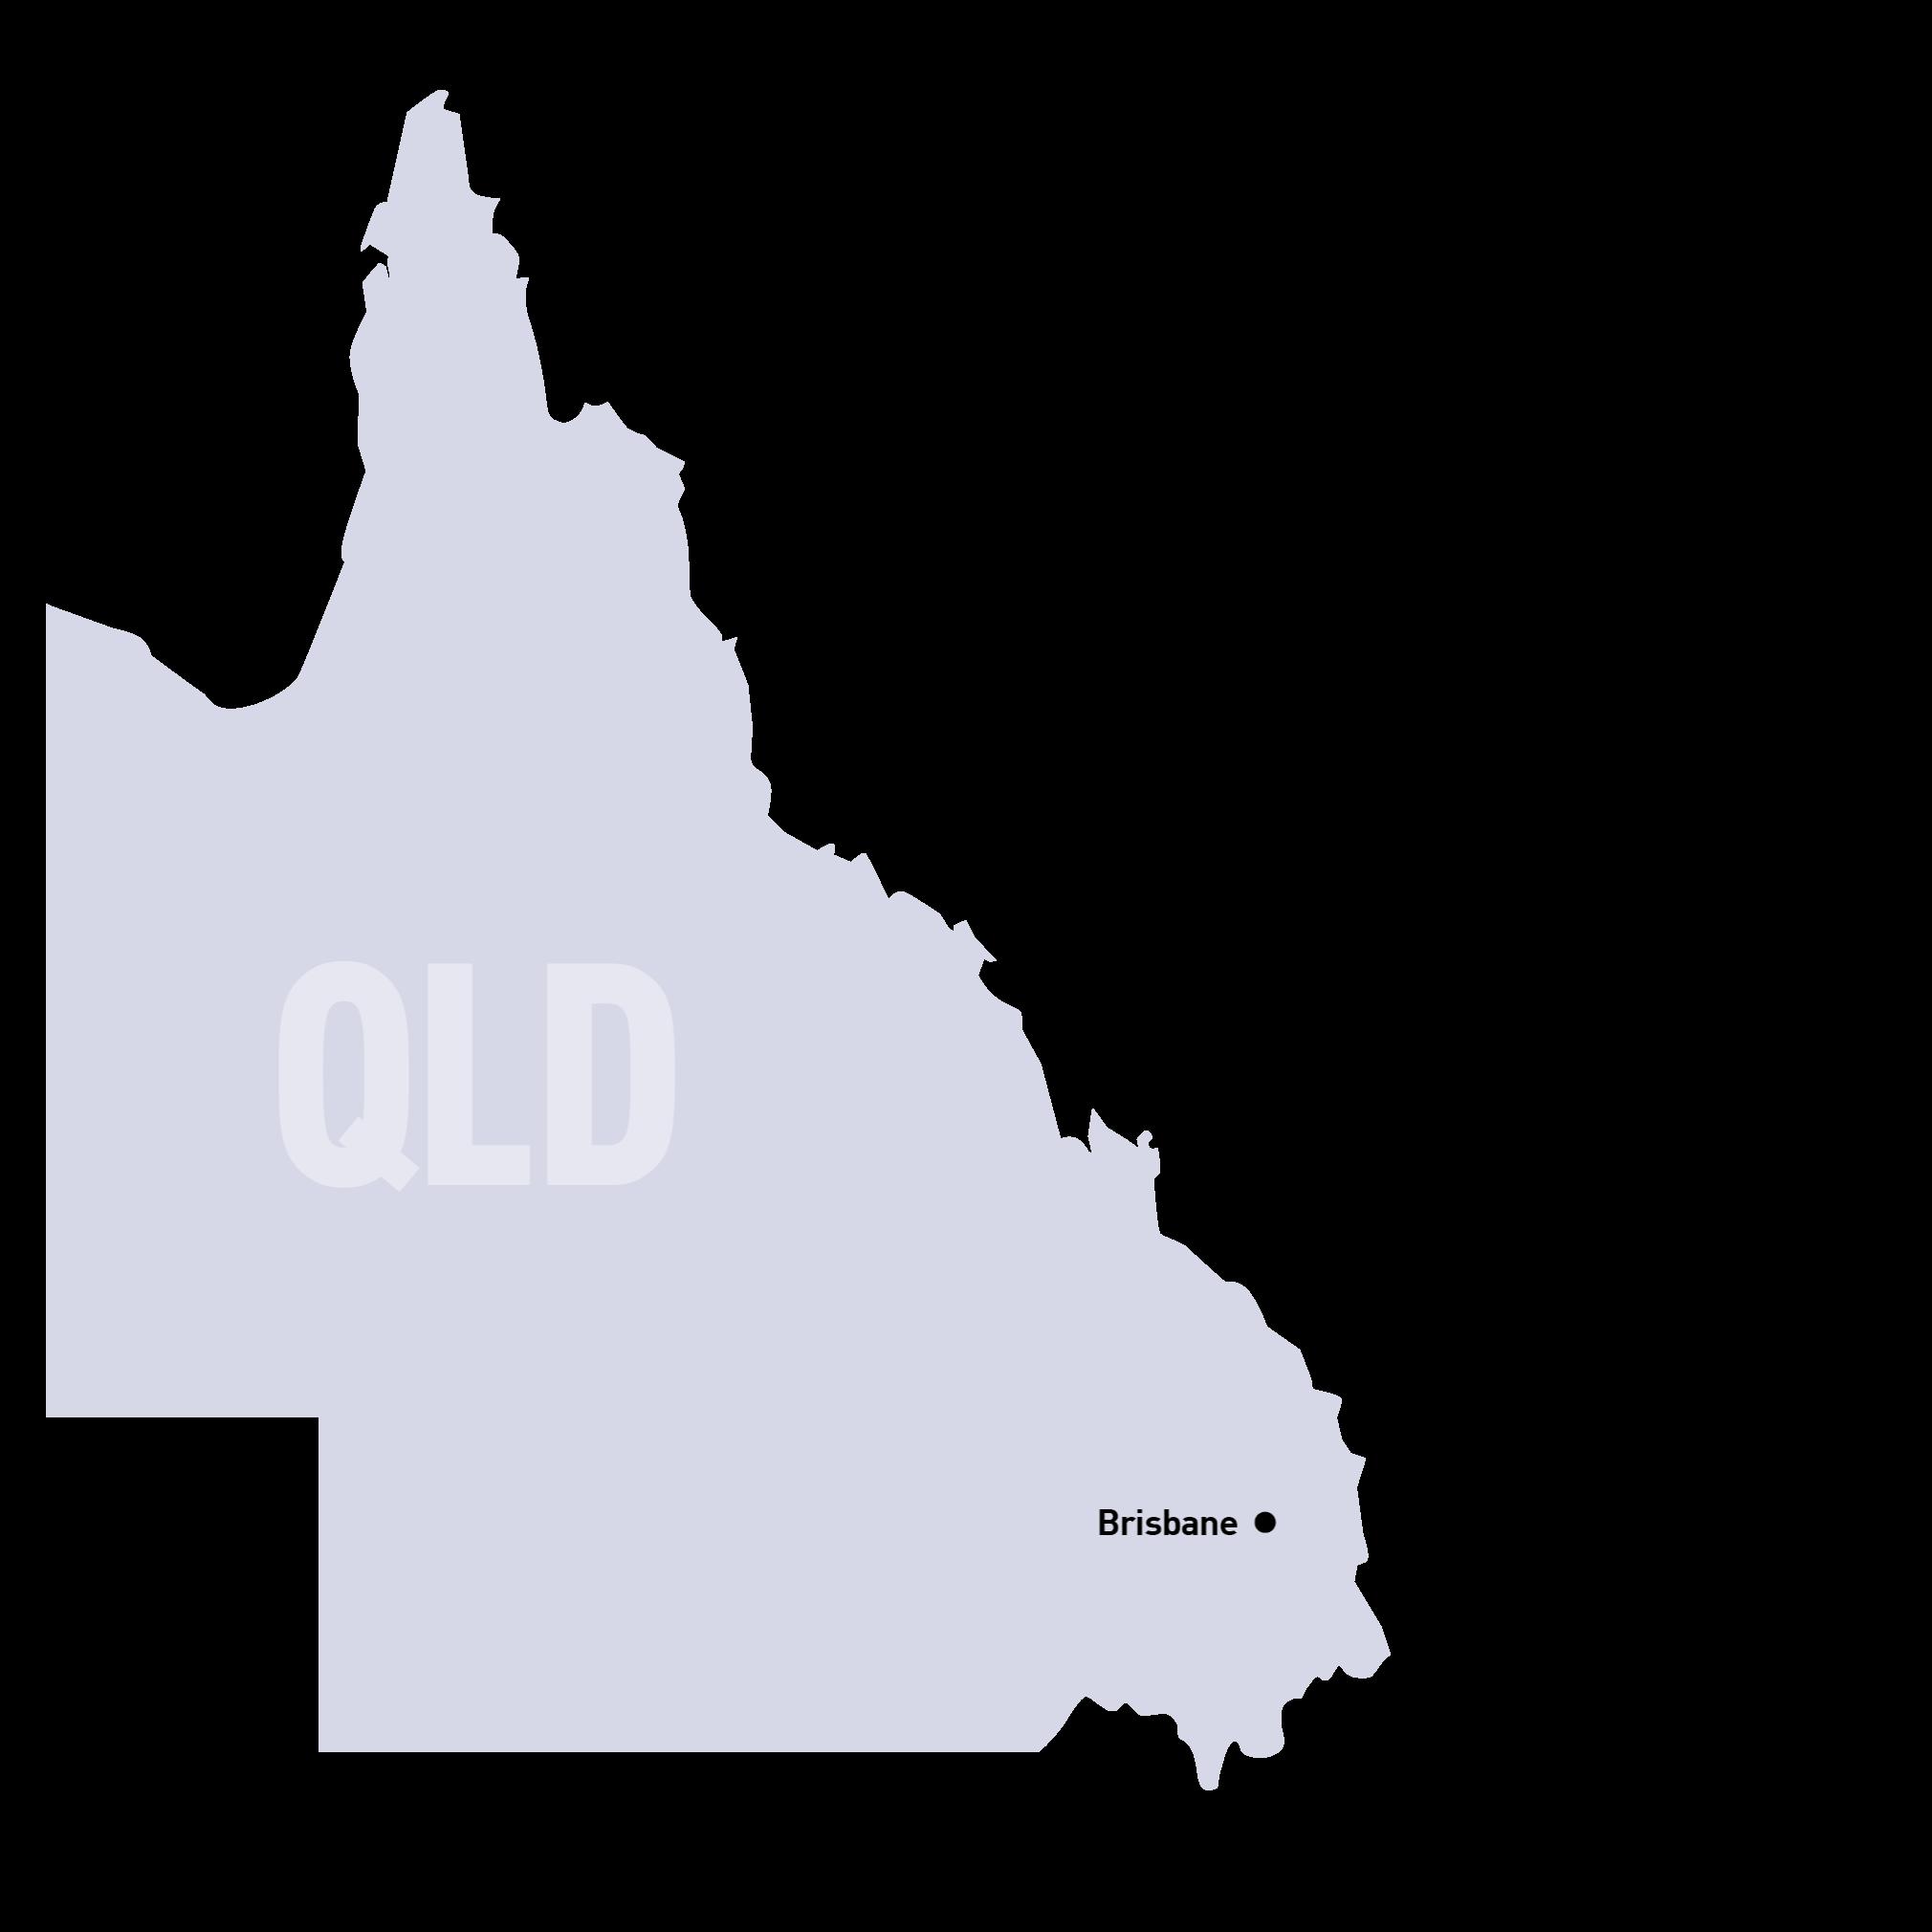 SUEZ States Maps QLD